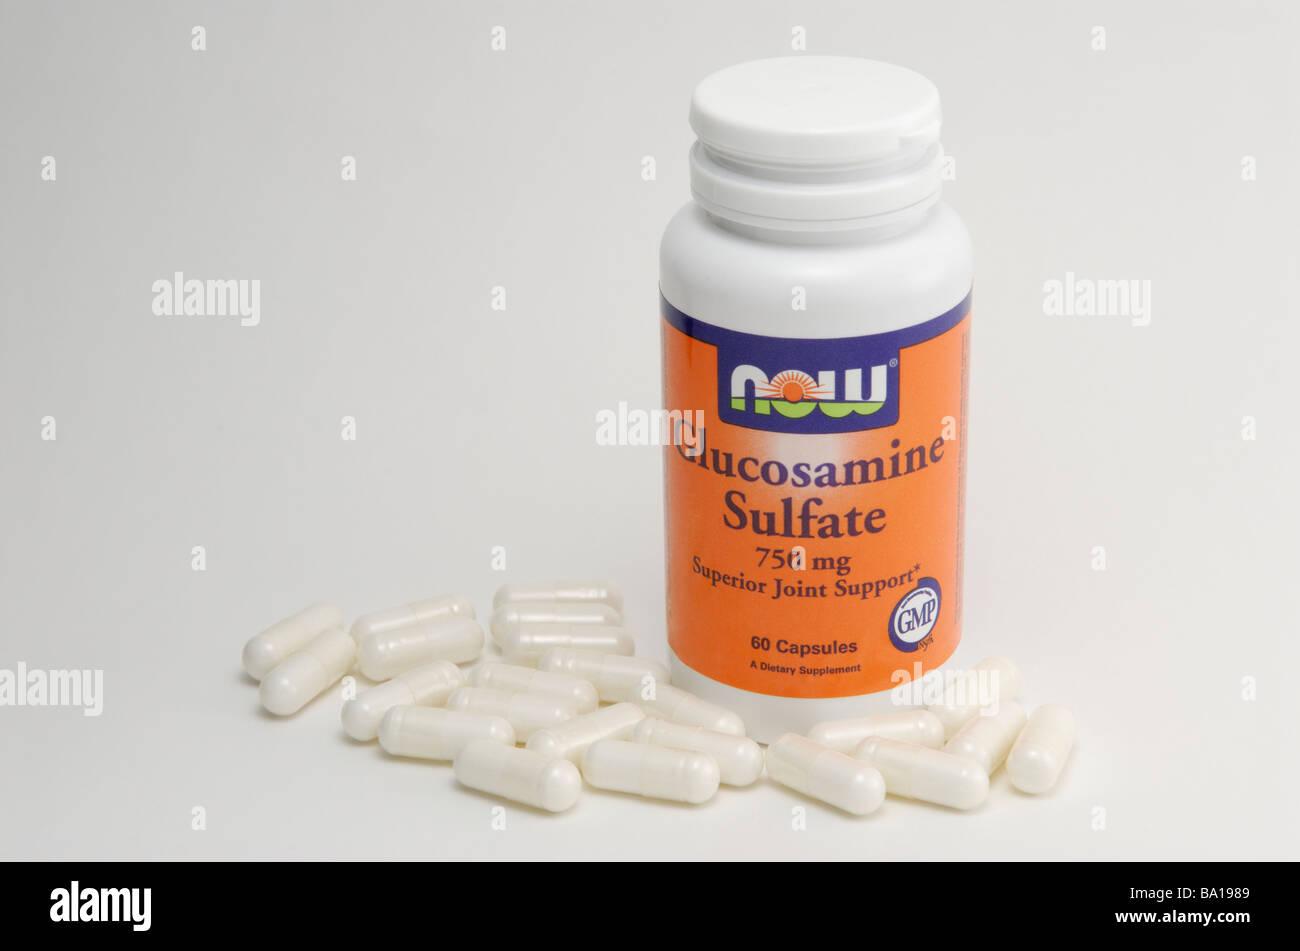 Glucosamine sulfate capsules. - Stock Image